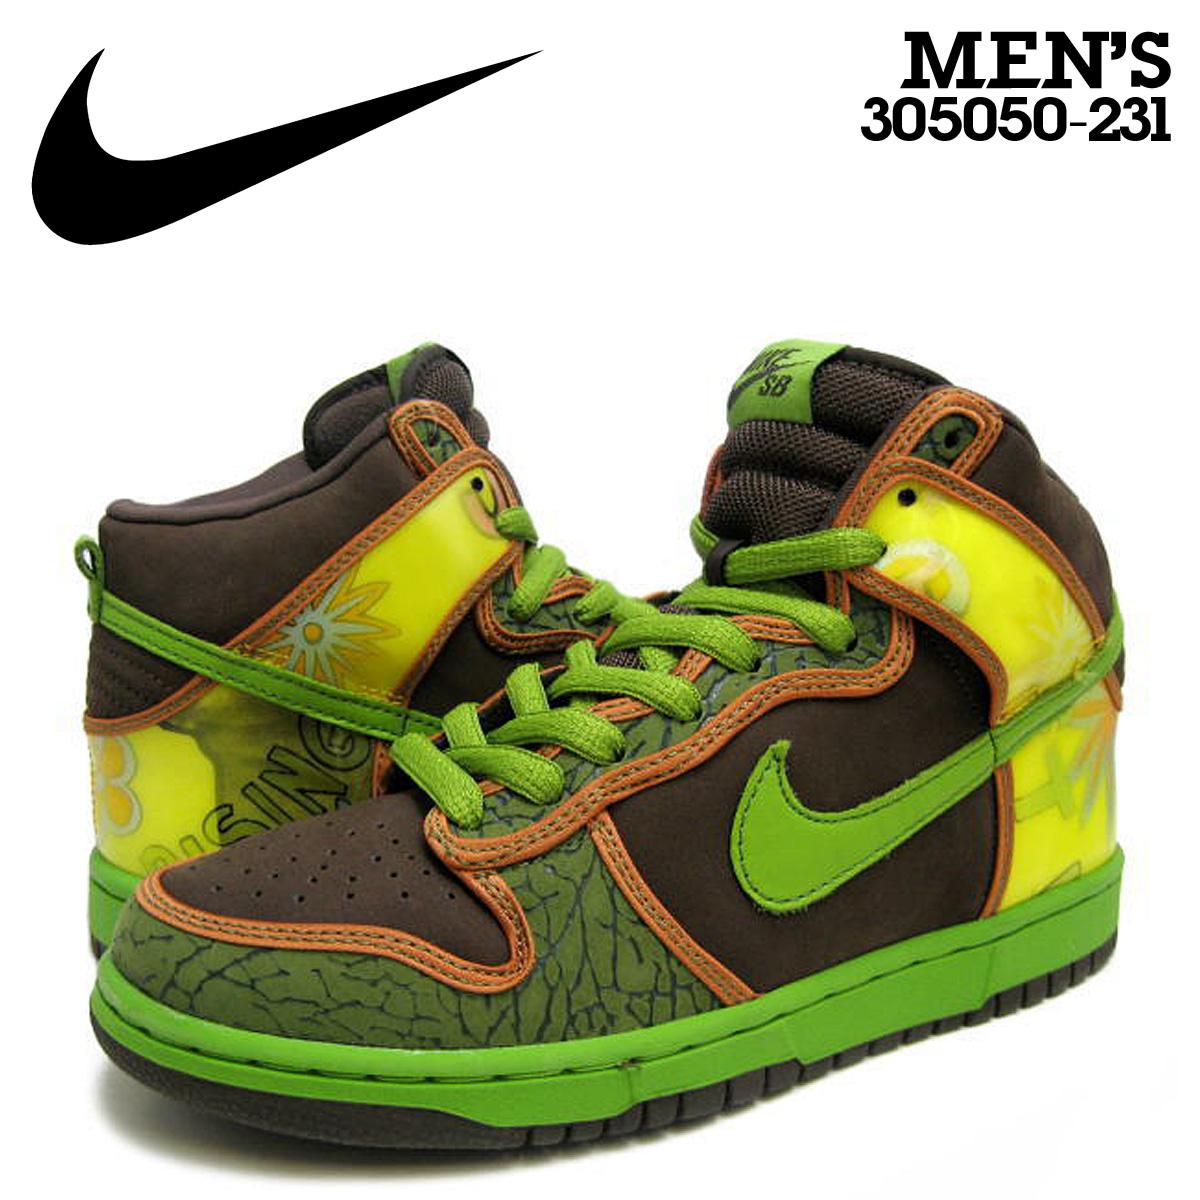 finest selection 7e270 f57e2 NIKE Nike dunk sneakers DUNK HIGH PRO SB DE LA SOUL dunk high professional  SB Delaware ...